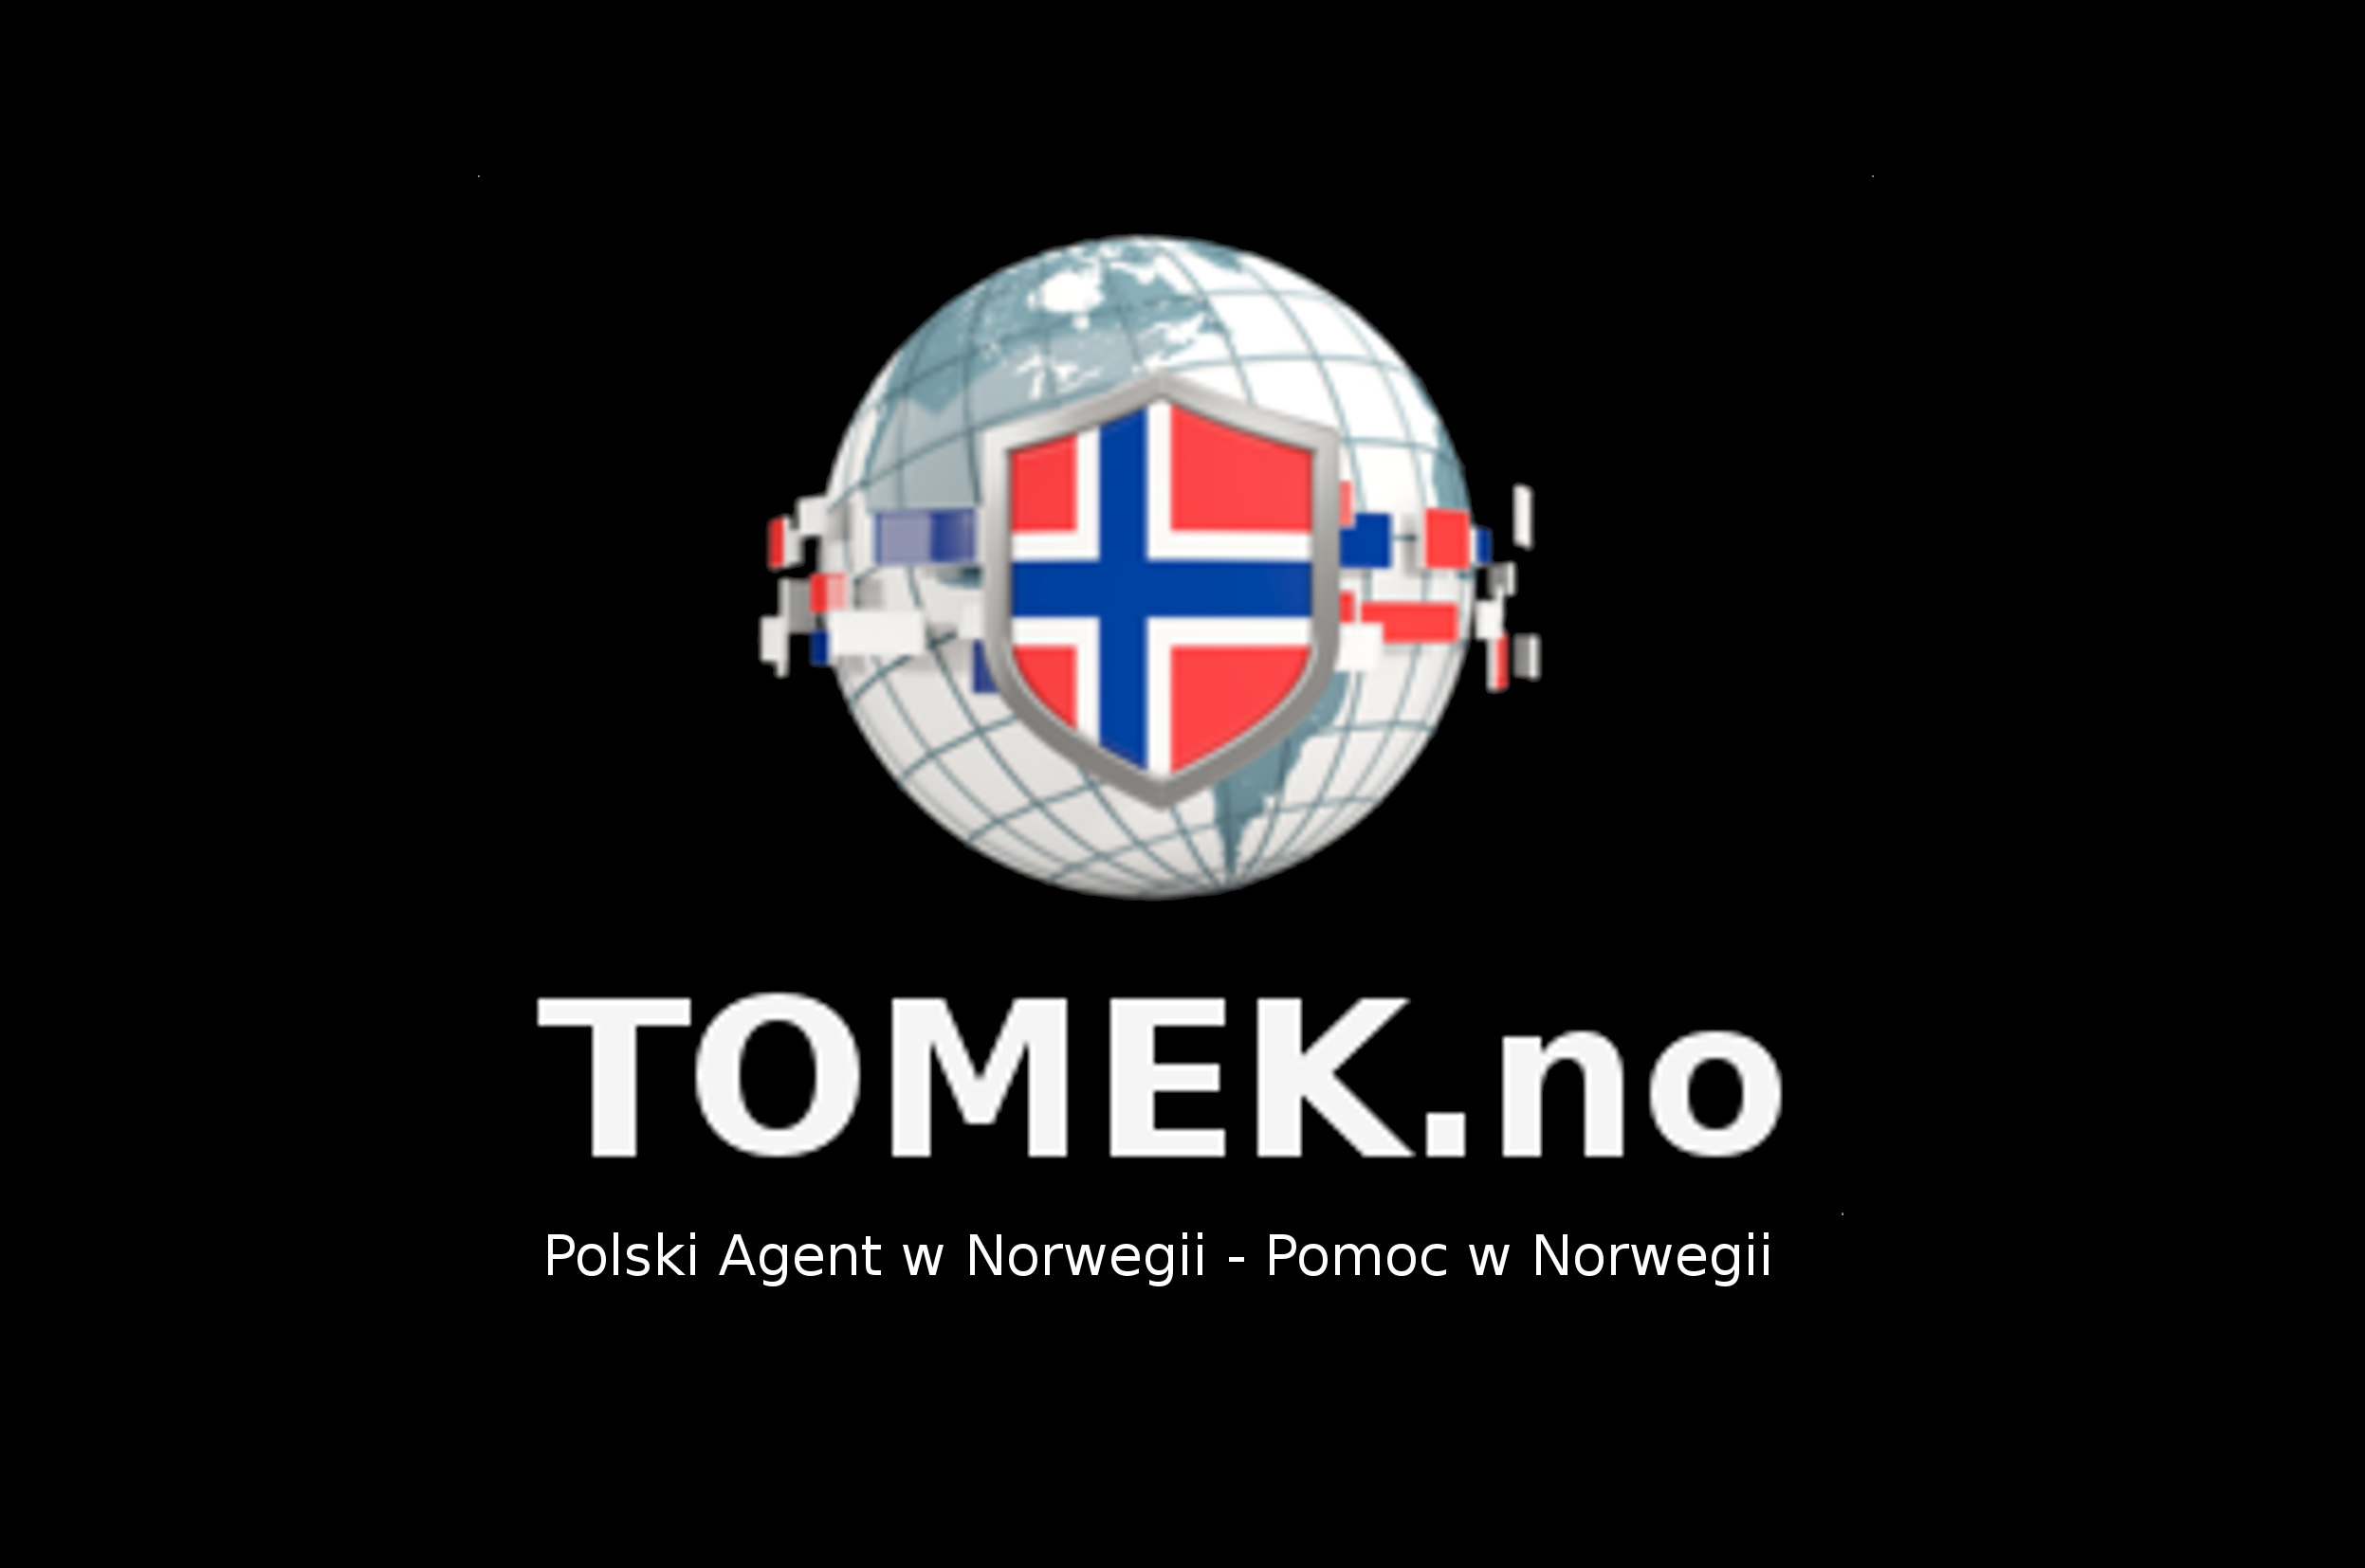 pomoc-w-norwegii-tomek.jpg